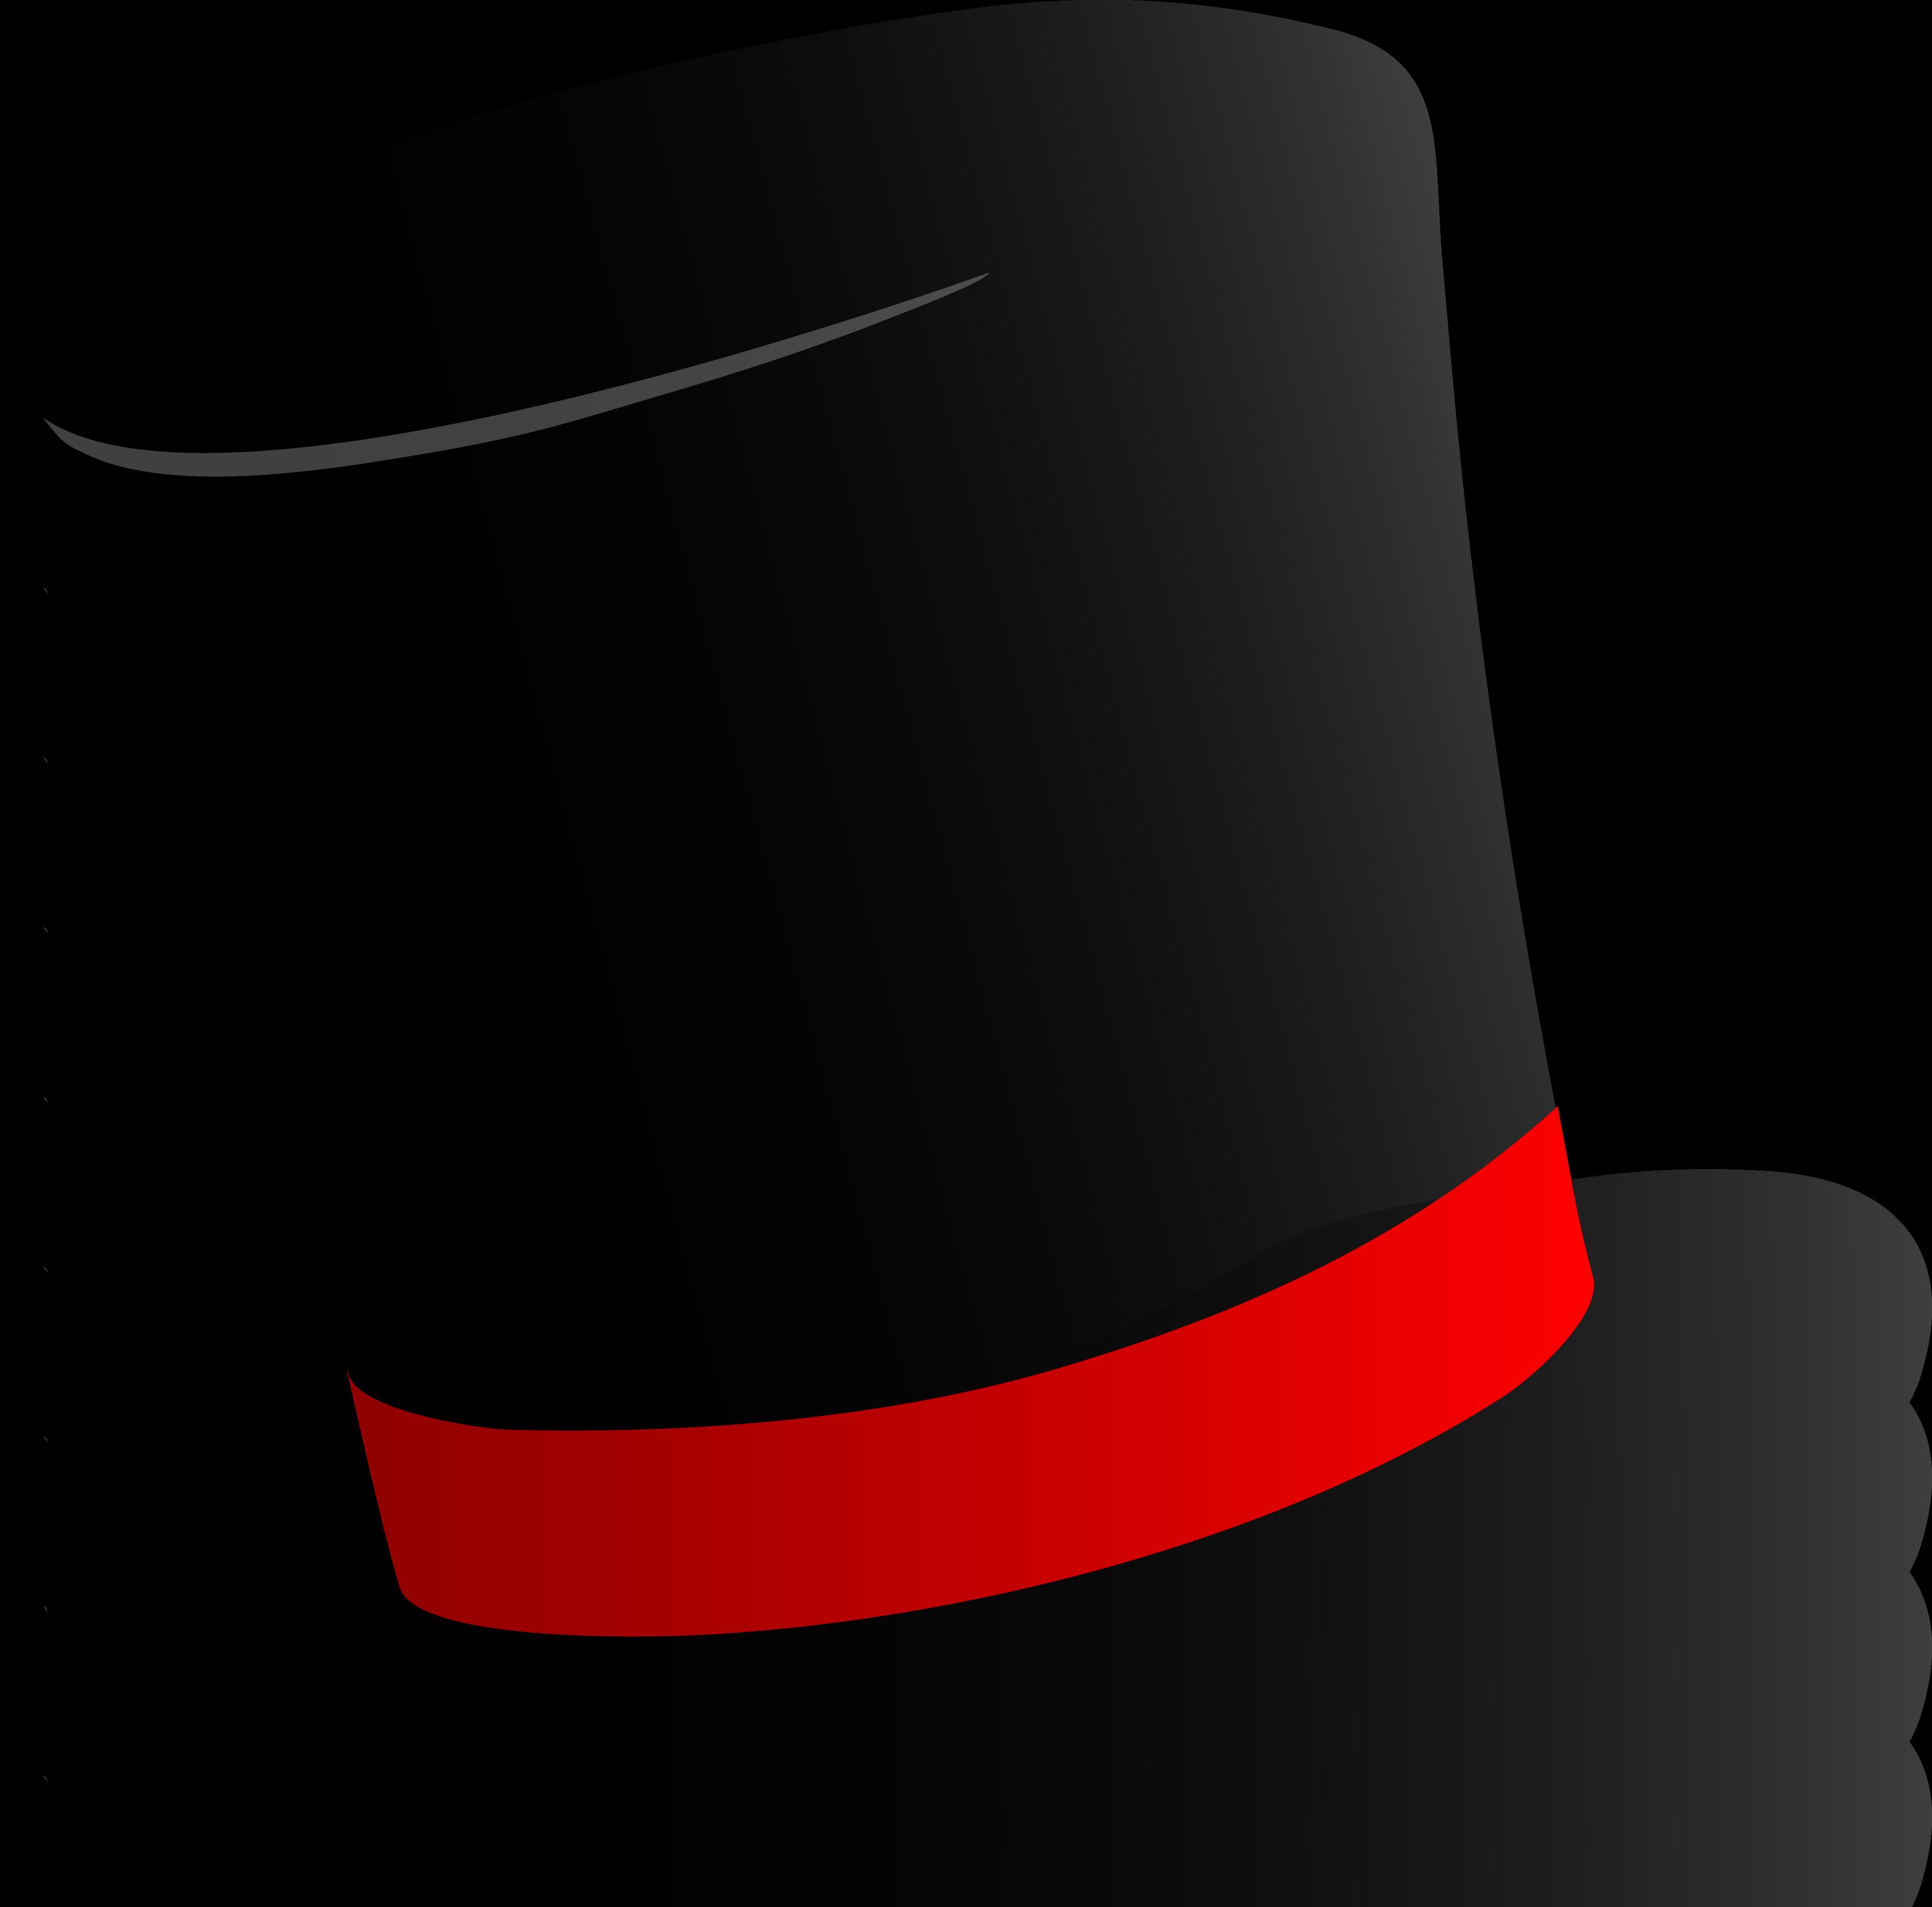 3858x3809 Black Top Hat Design